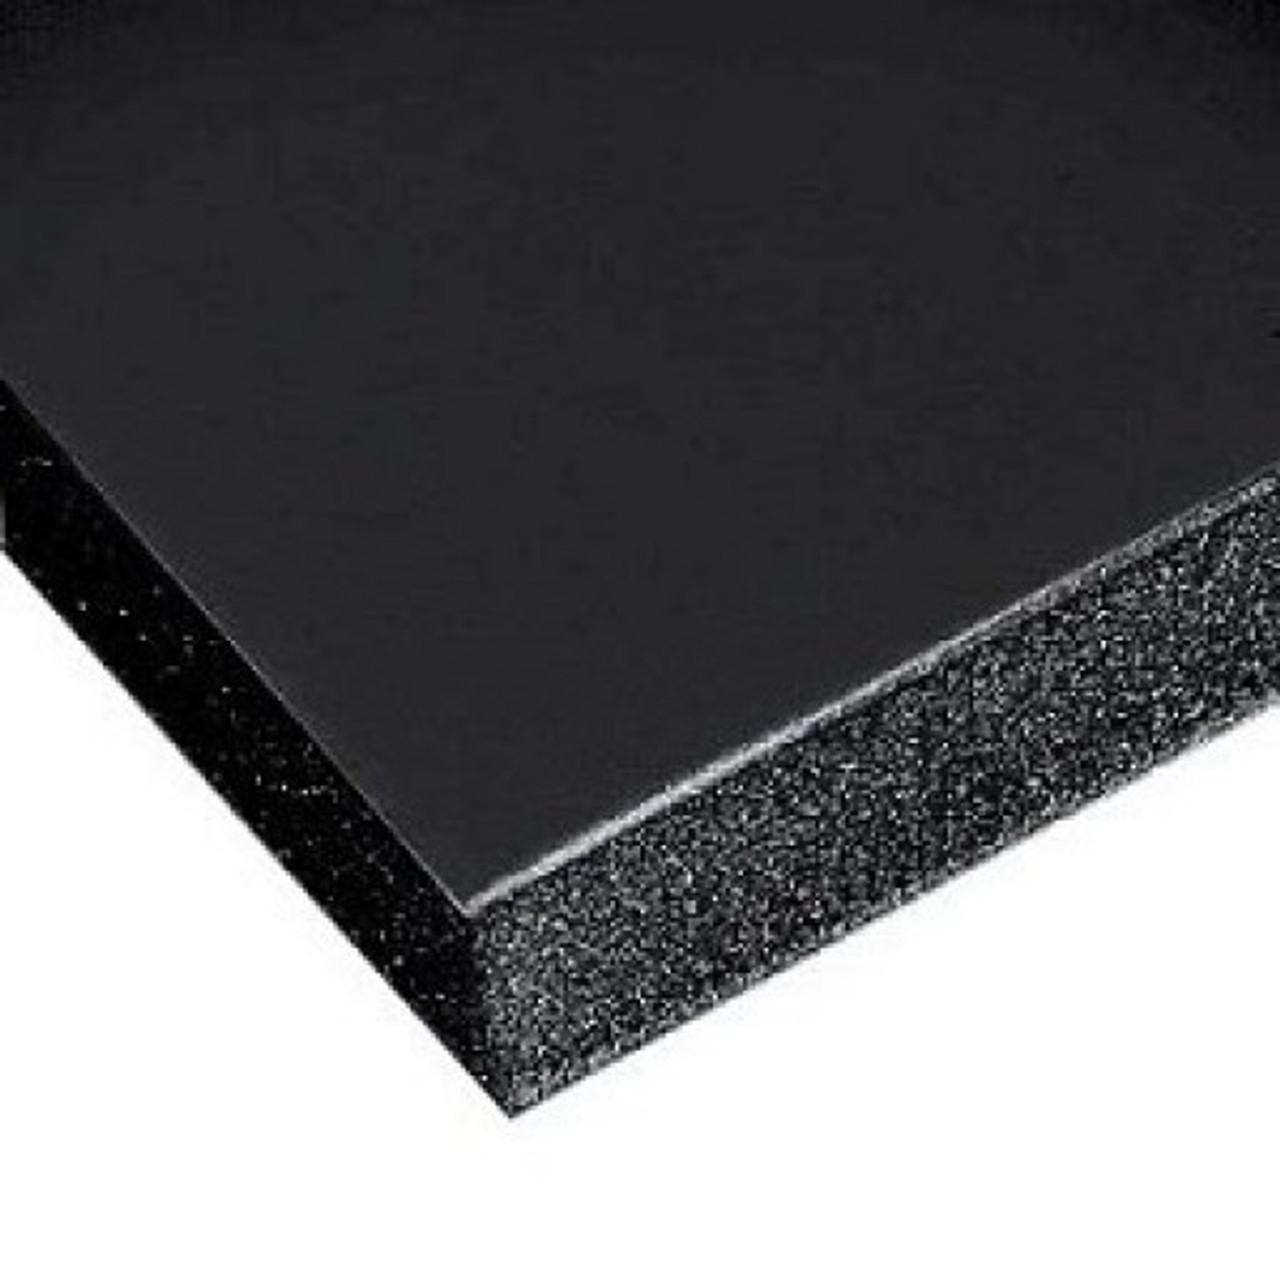 "Gator Board - Black/Black -  4' x 8' x 1/2"""